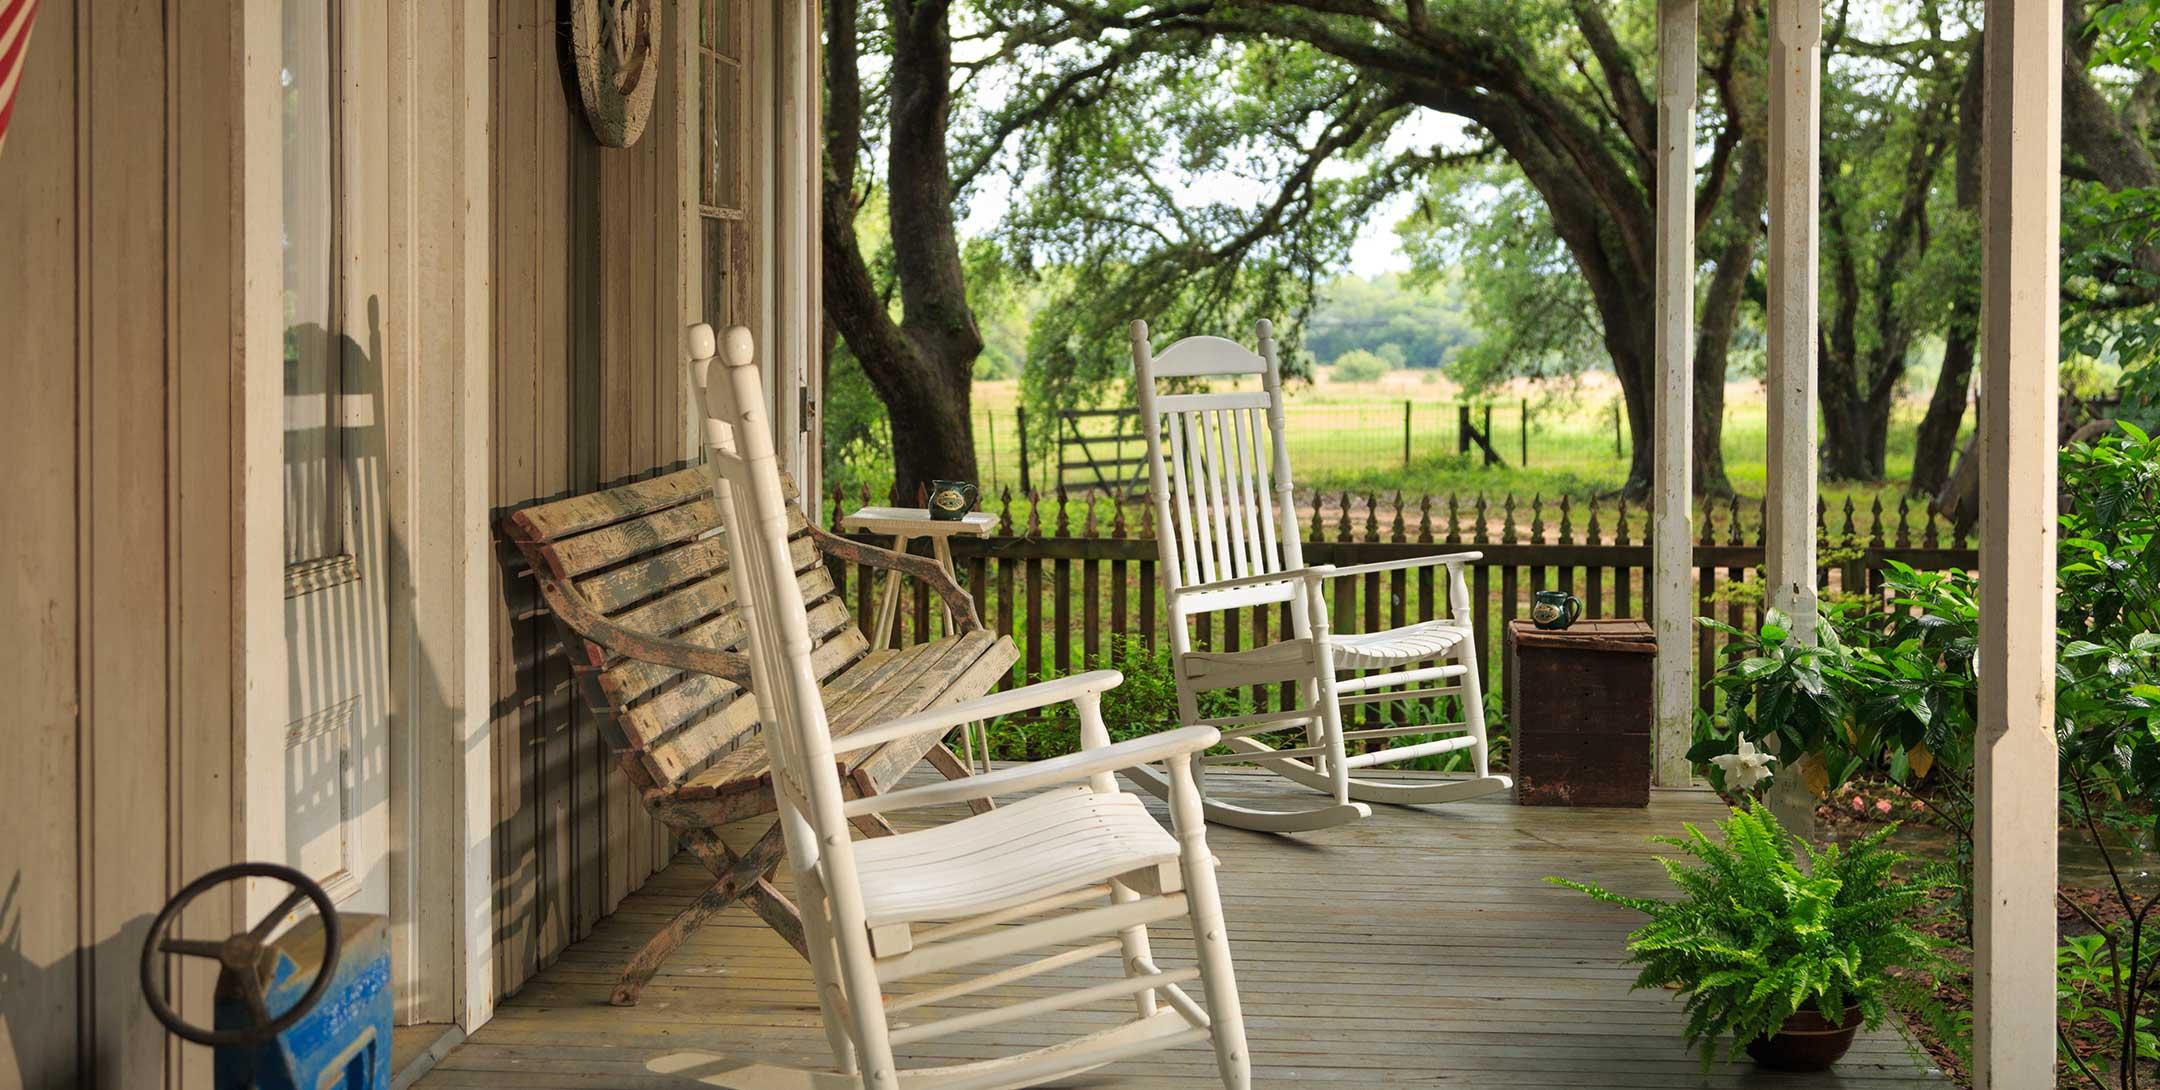 Texas Farm House porch